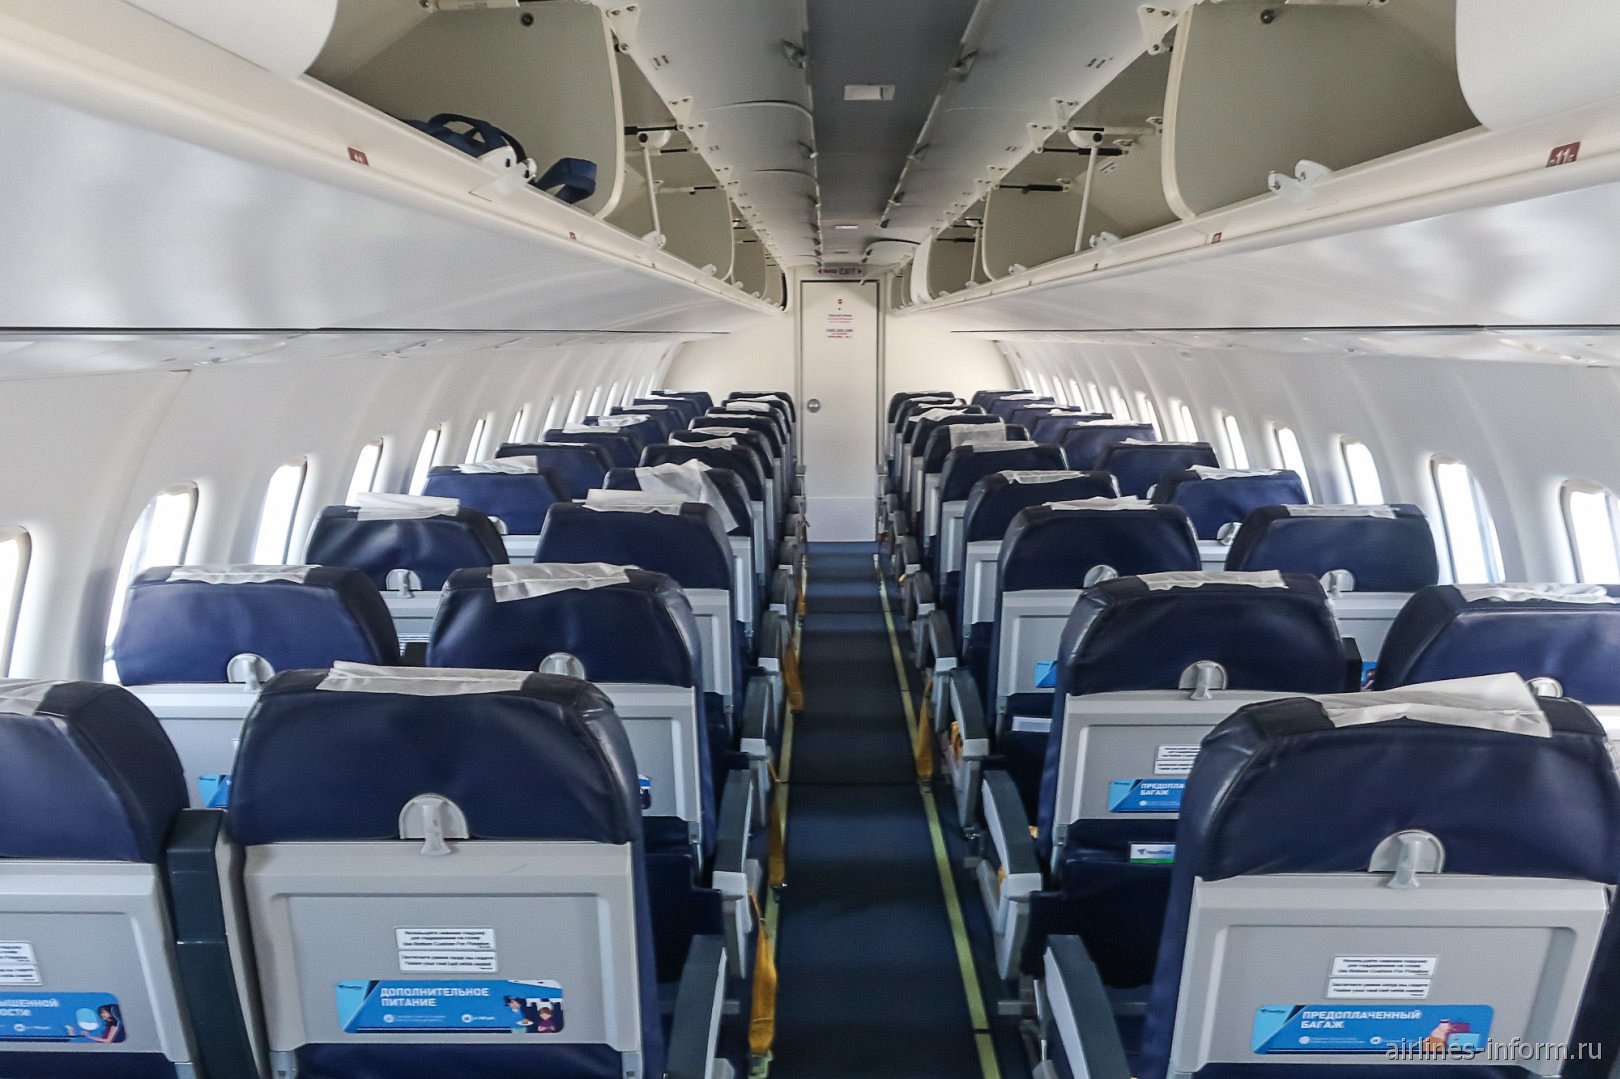 Пассажирский салон самолета ATR-42-500 авиакомпании NordStar